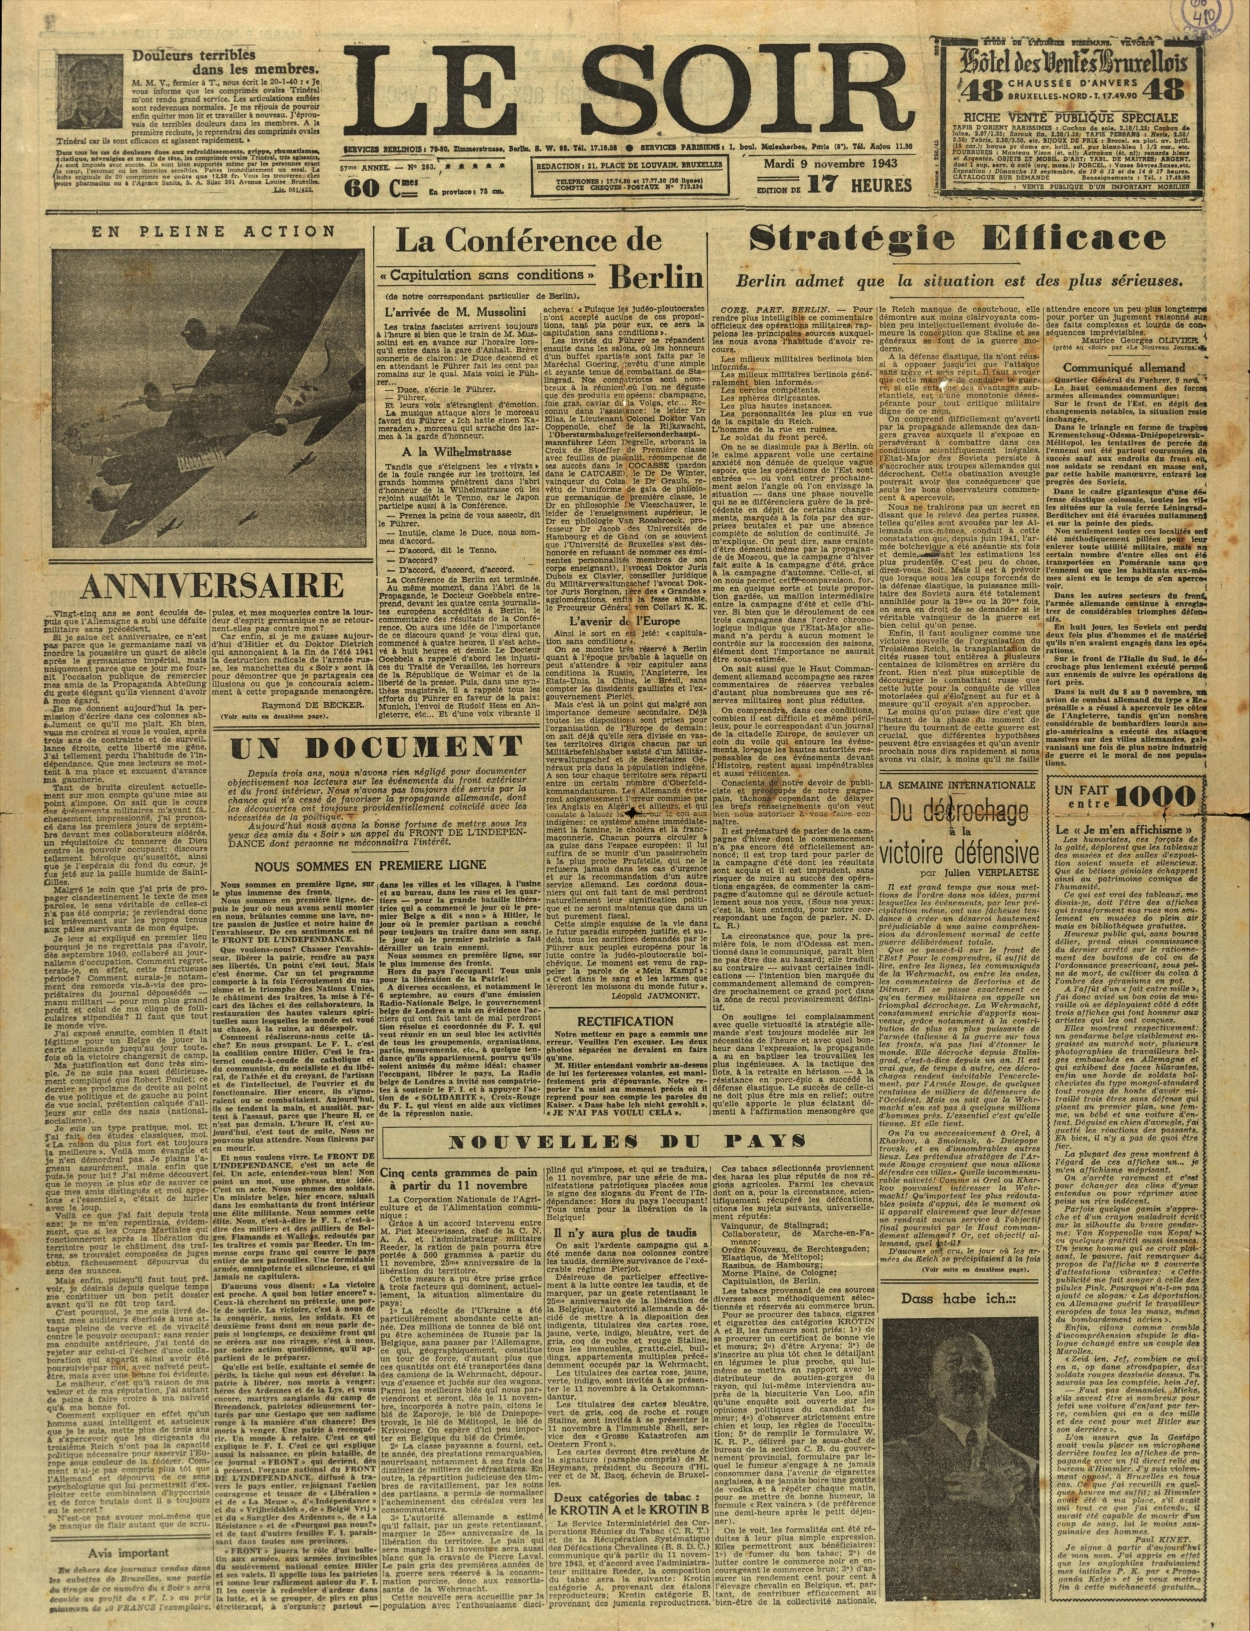 Le Soir, 9 november 1943